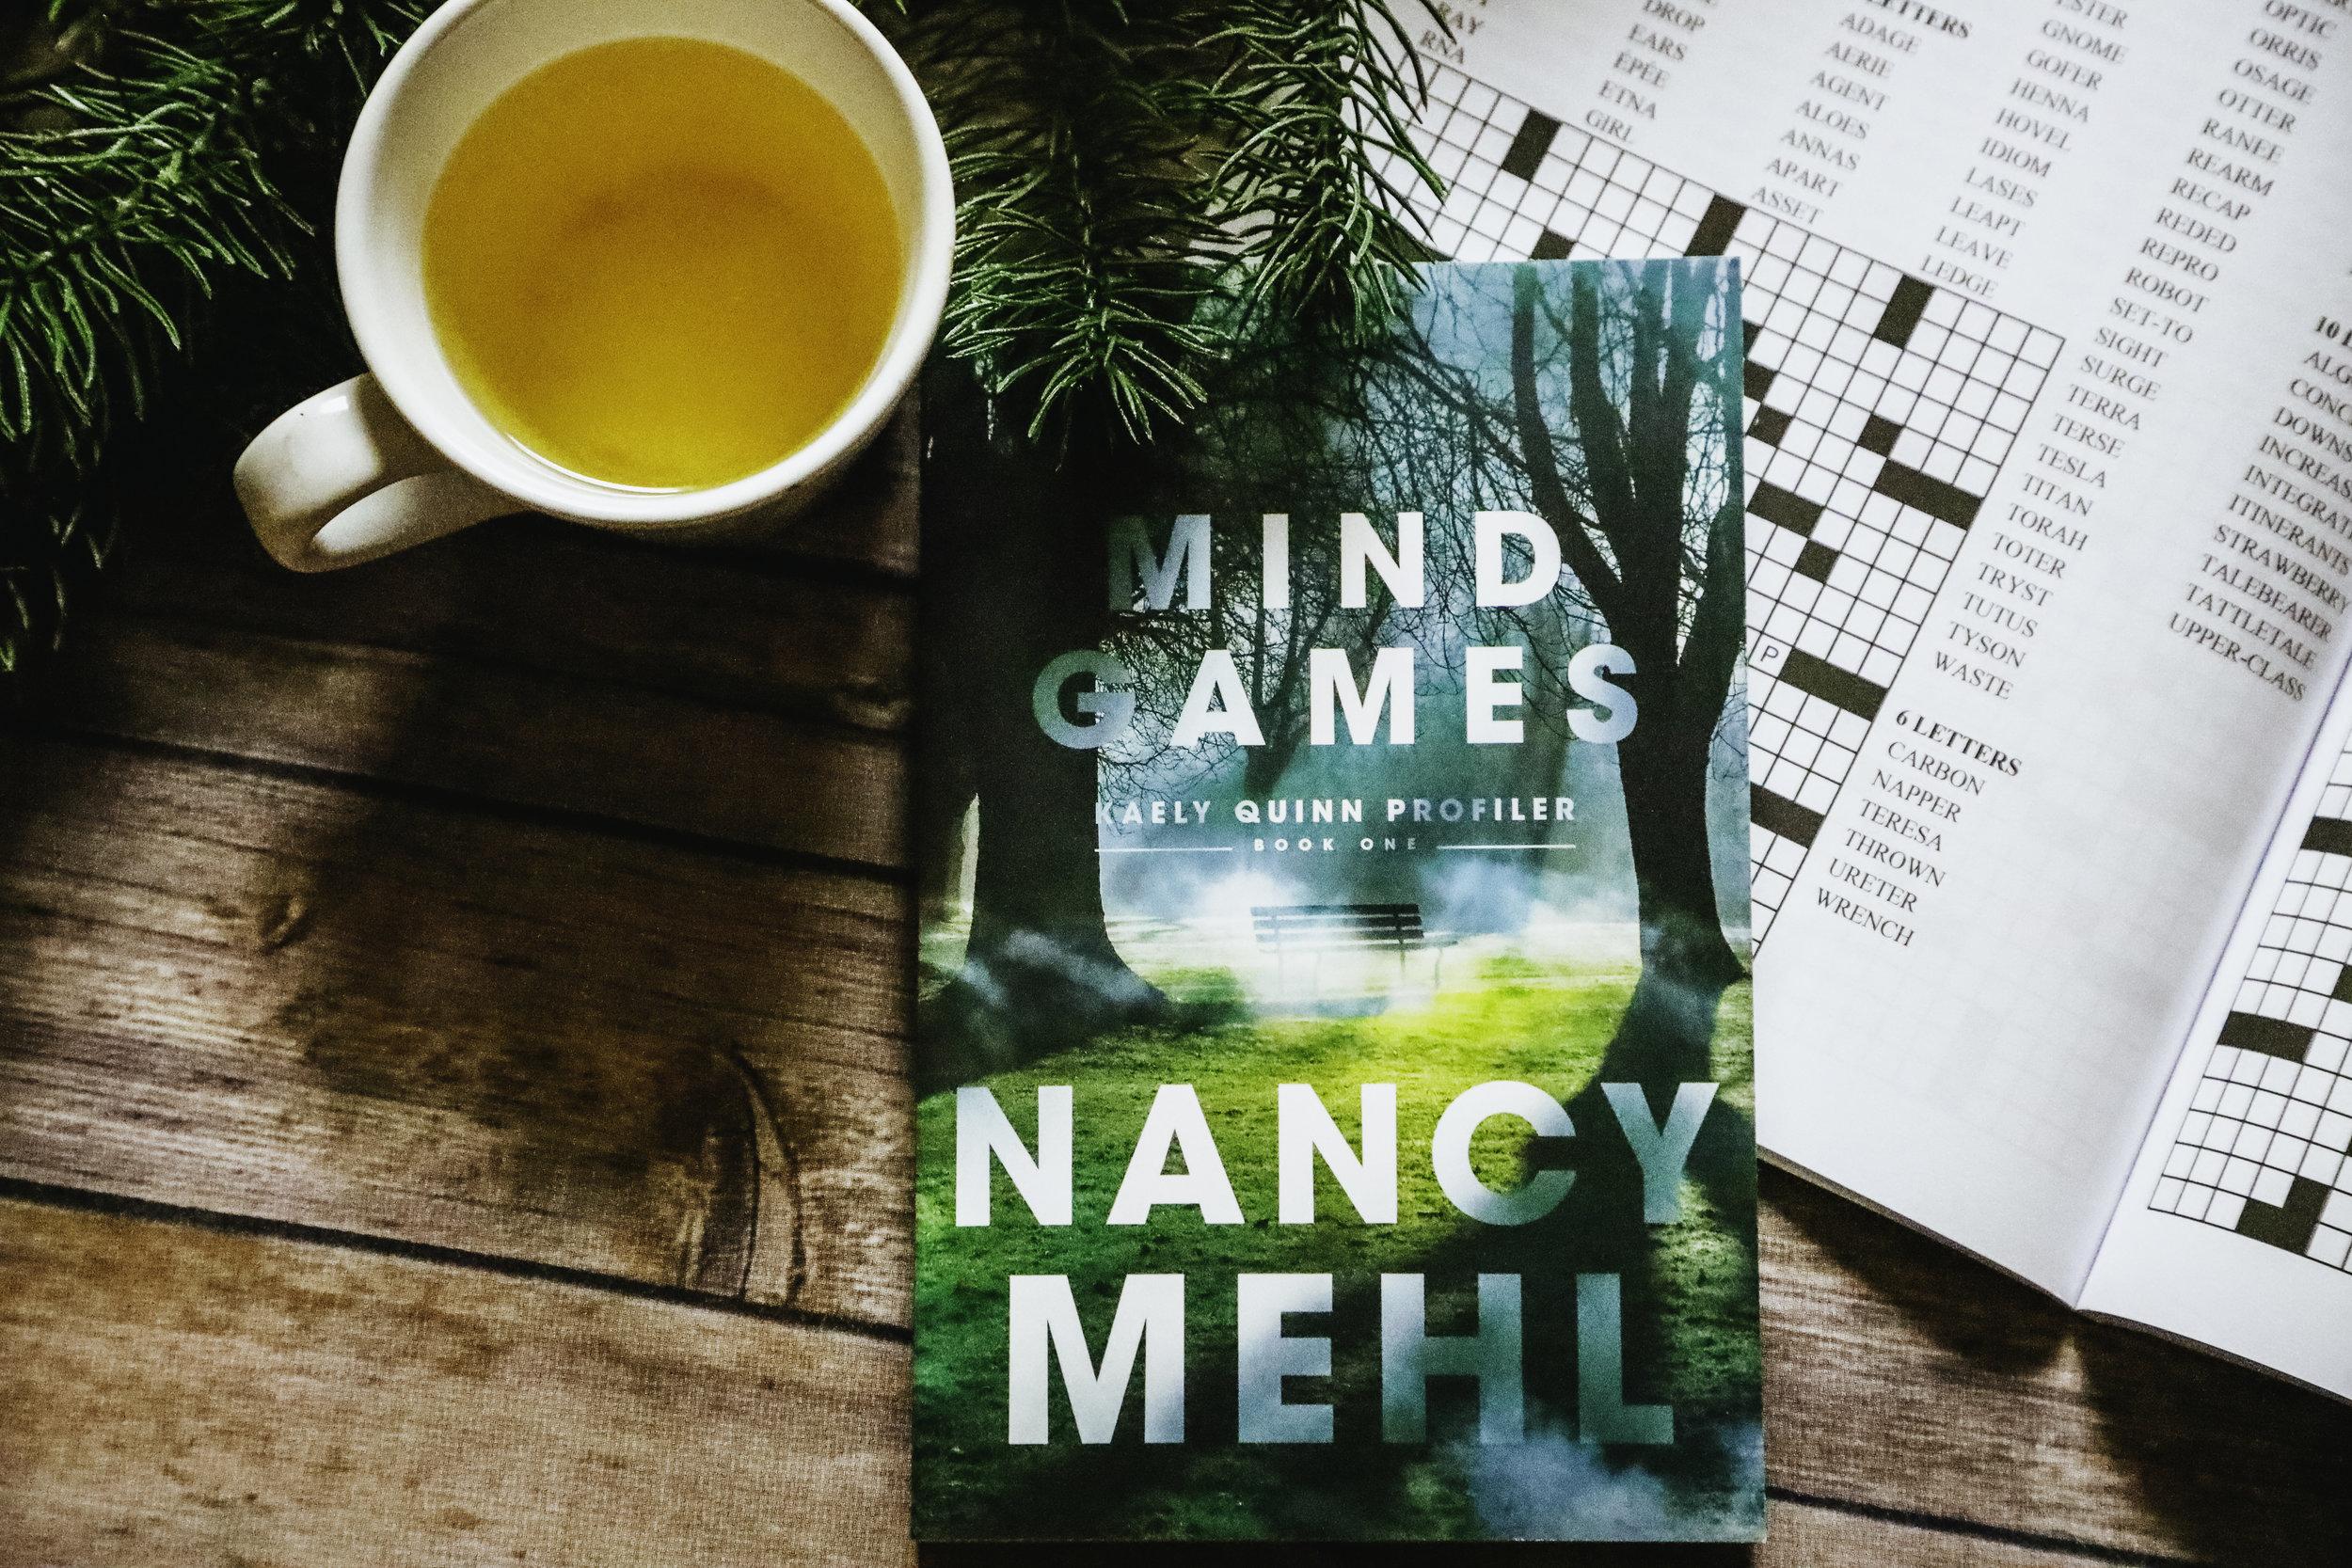 mind games nancy mehl book review